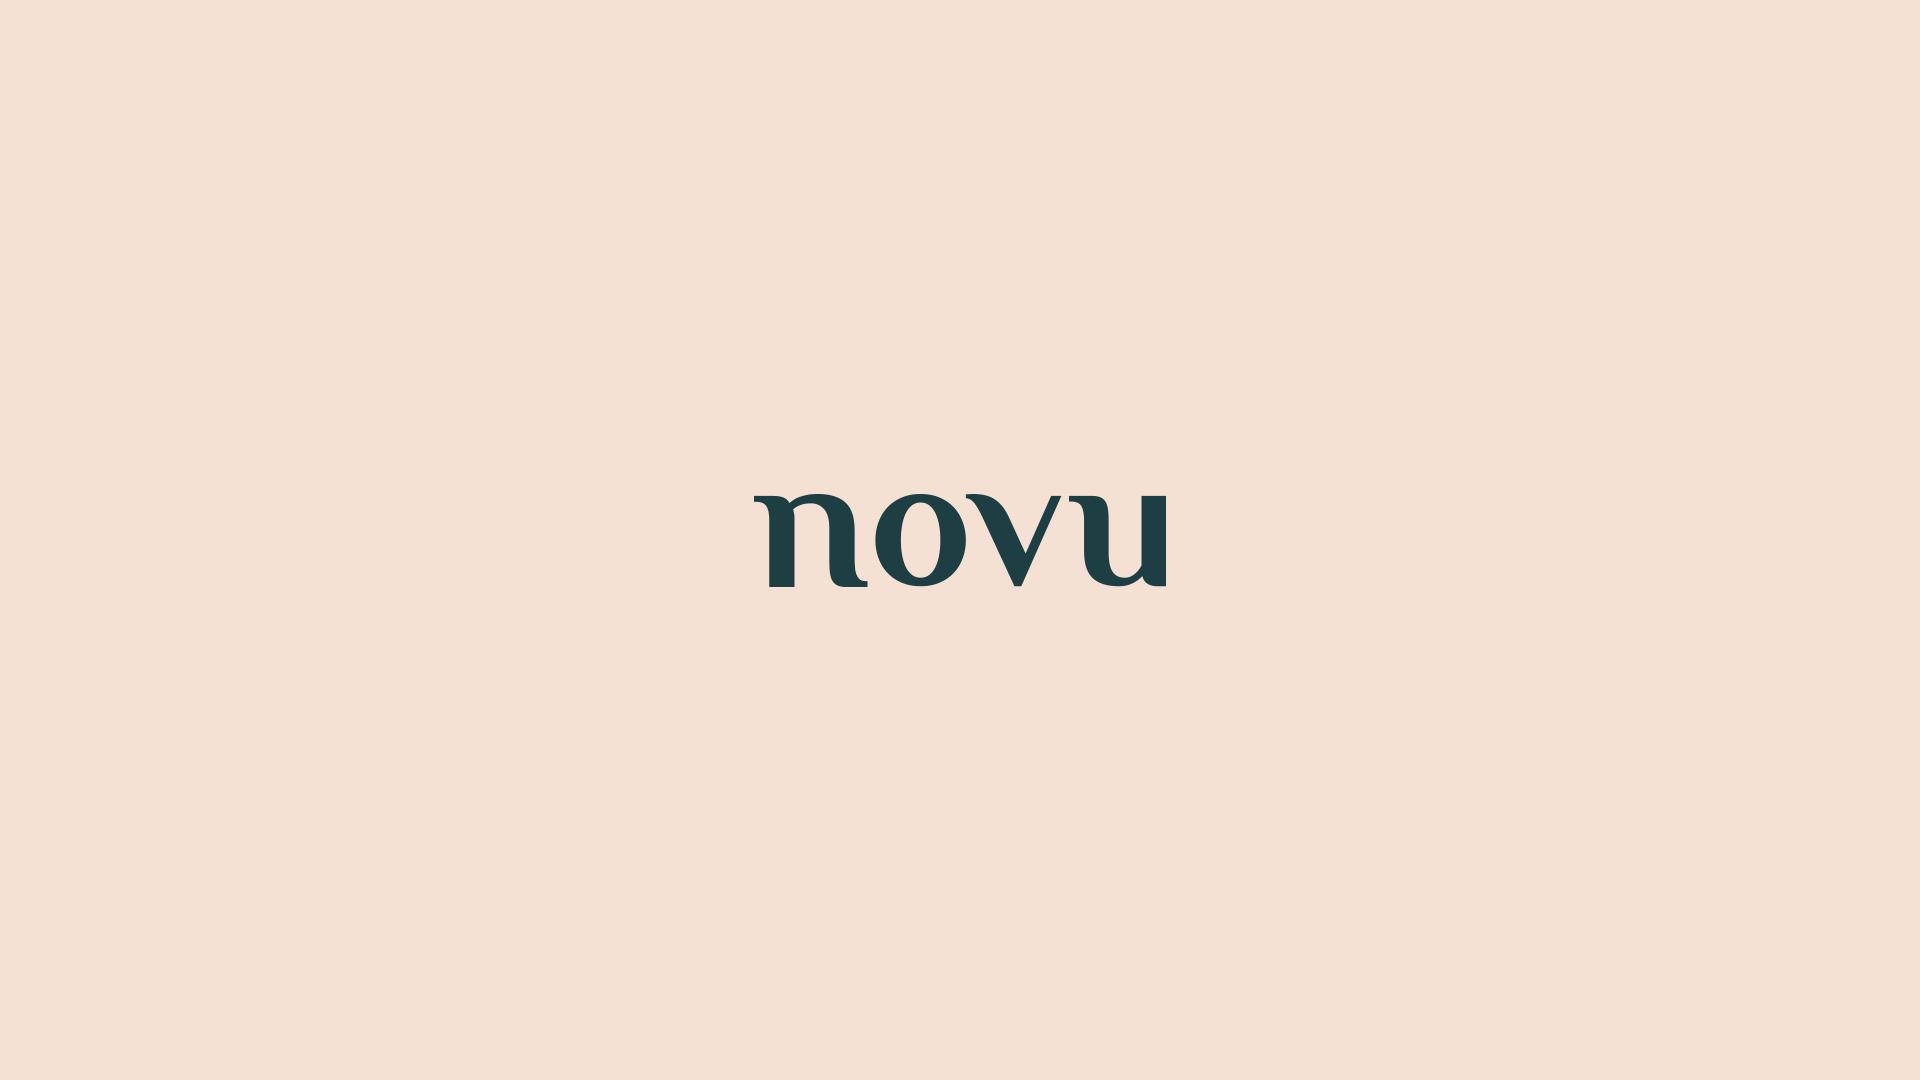 Novu_Branding_2.png